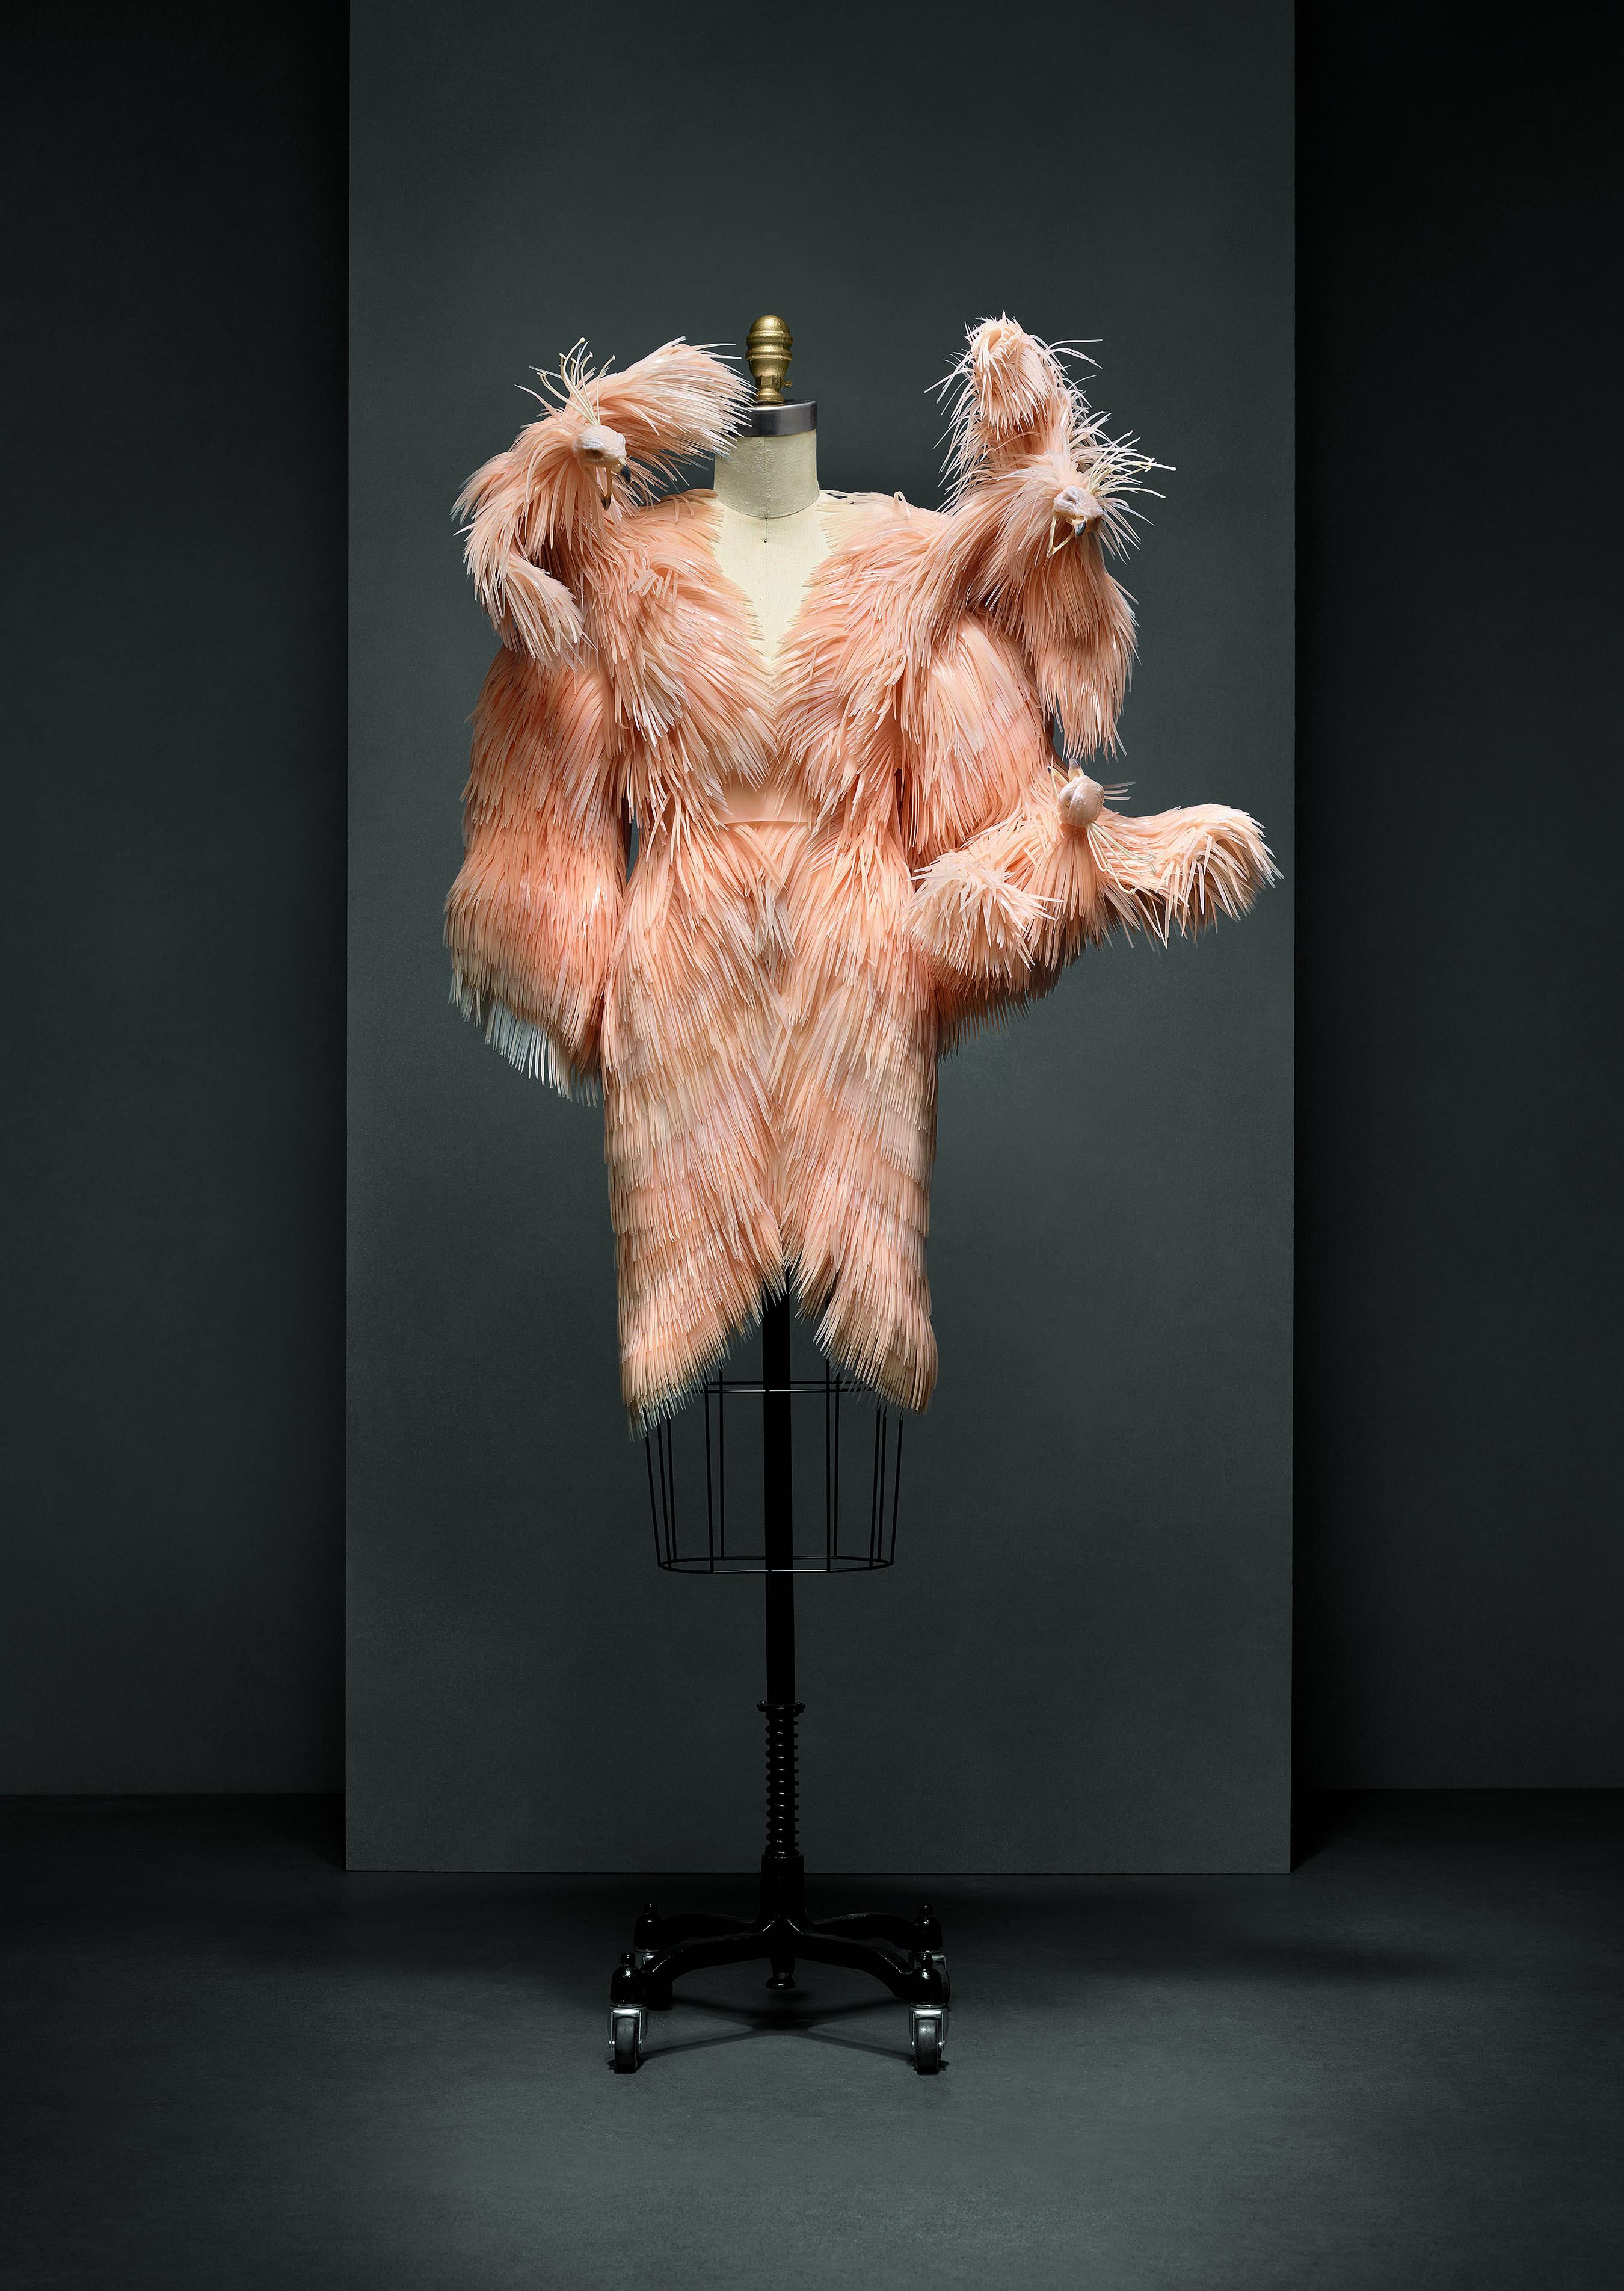 05.Dress,IrisVanHerpen,Autumn2013